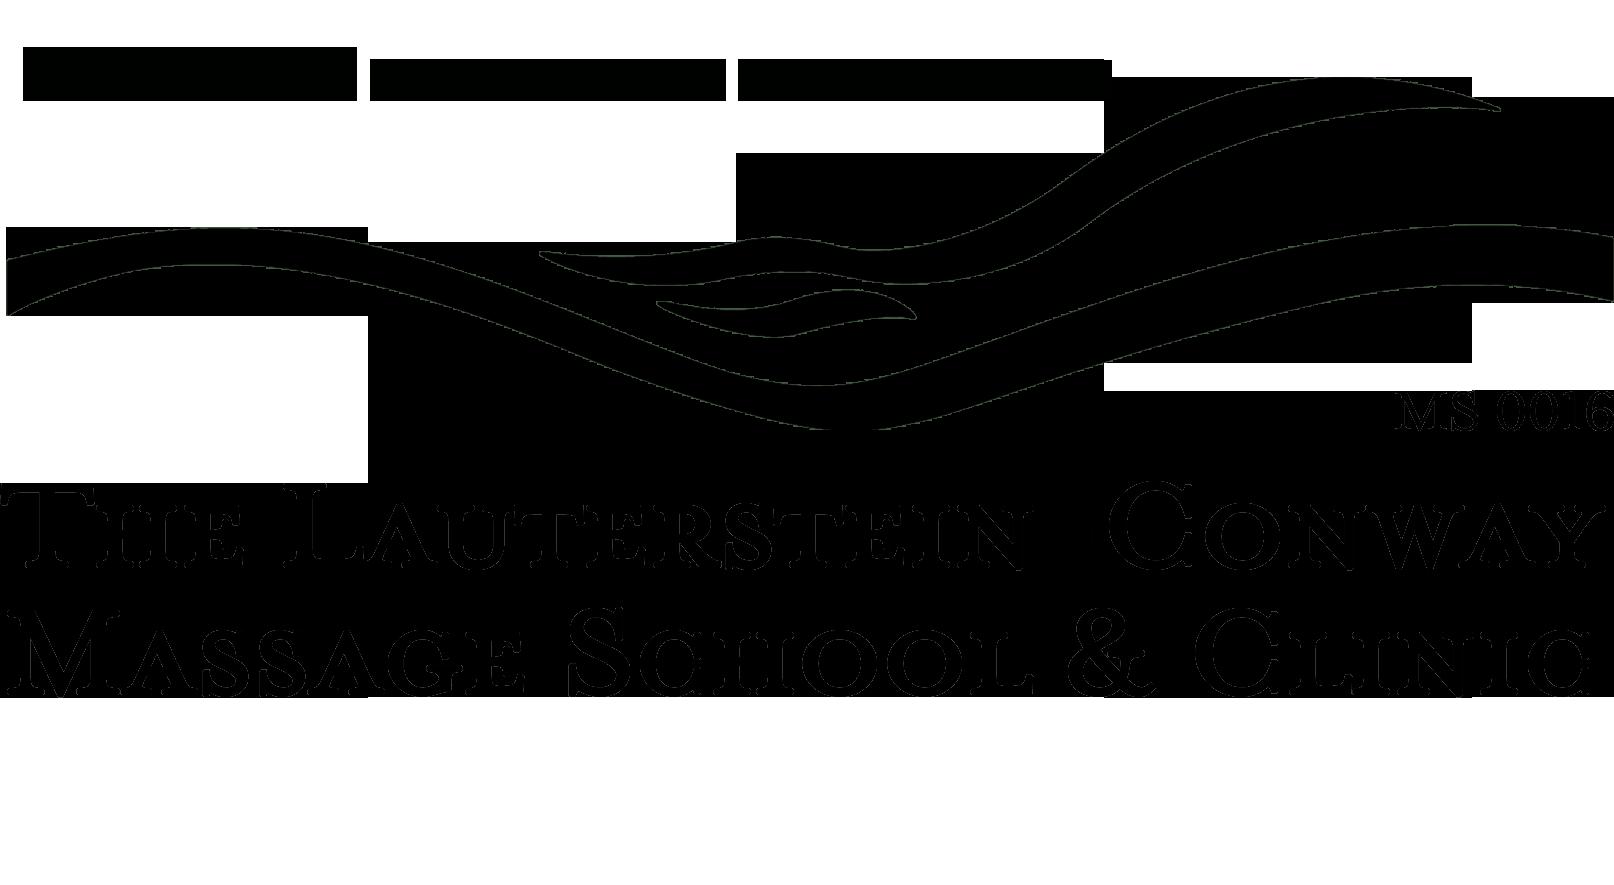 2019 logo blk.png